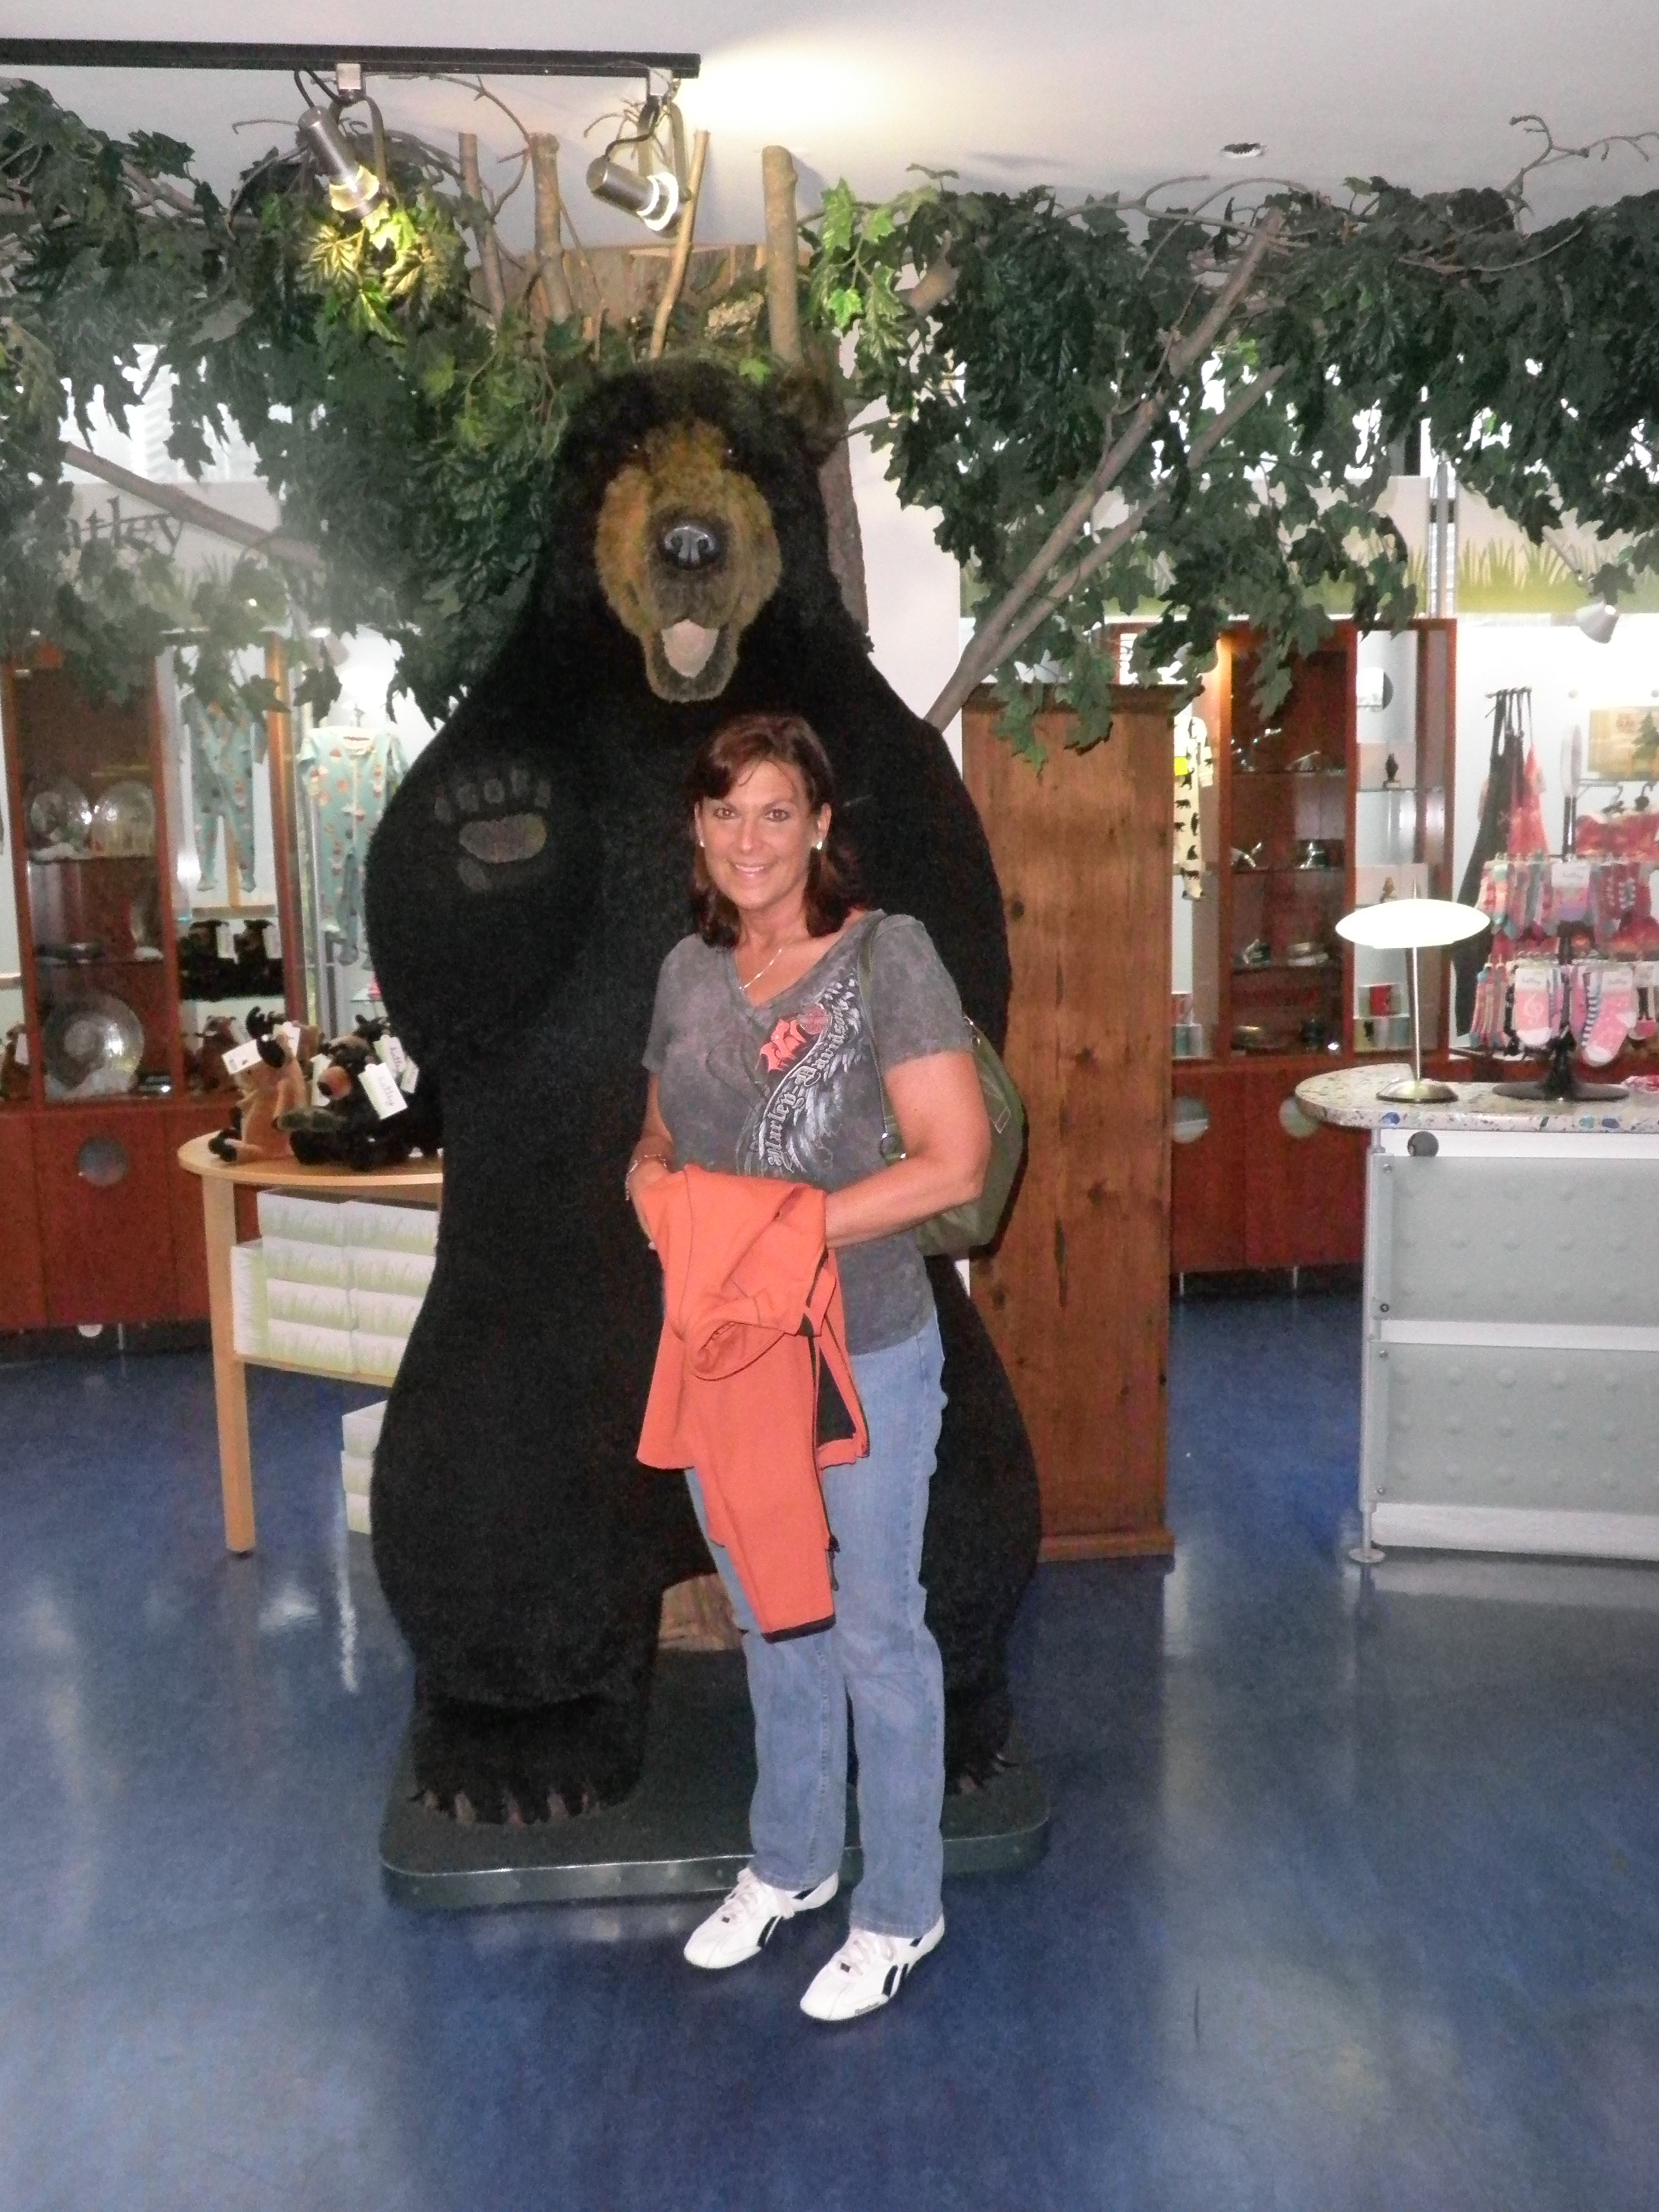 big bear2.jpg